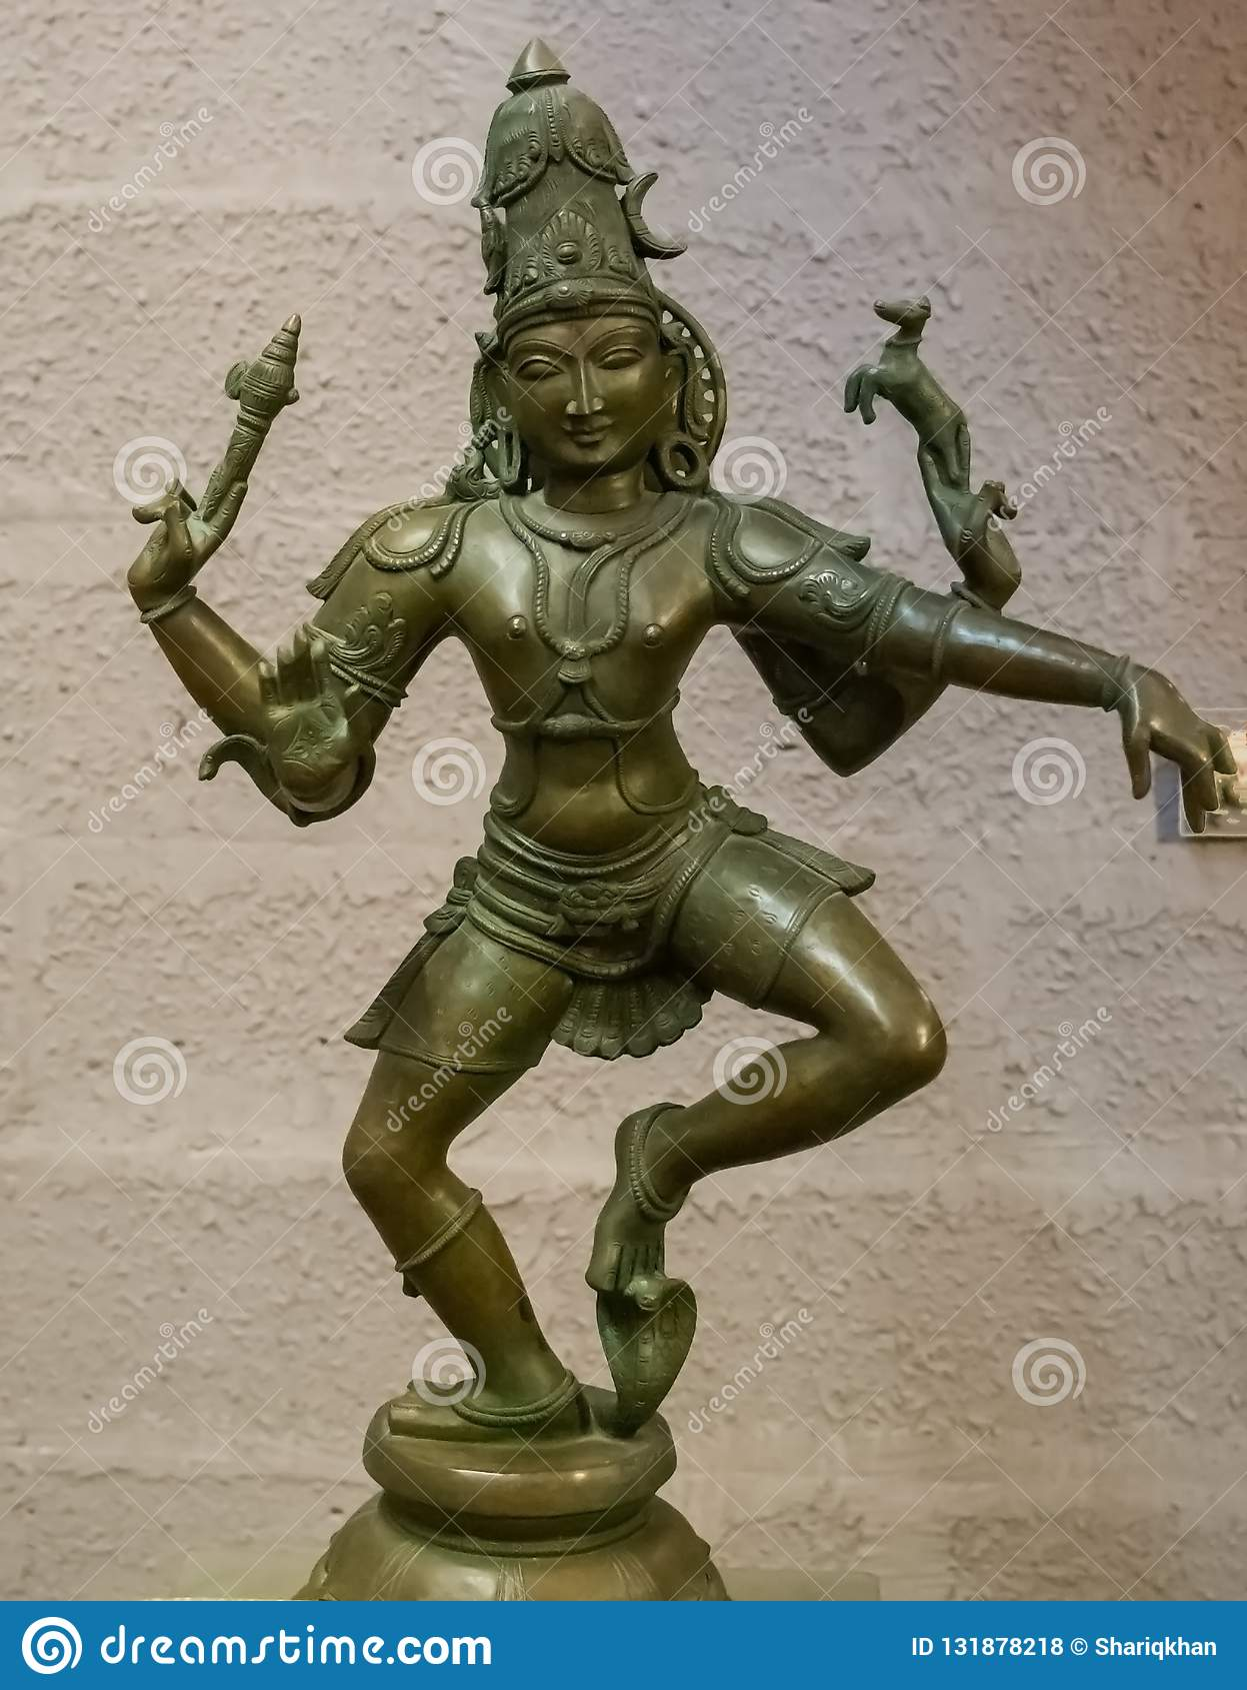 Shiva Sculpture India estando